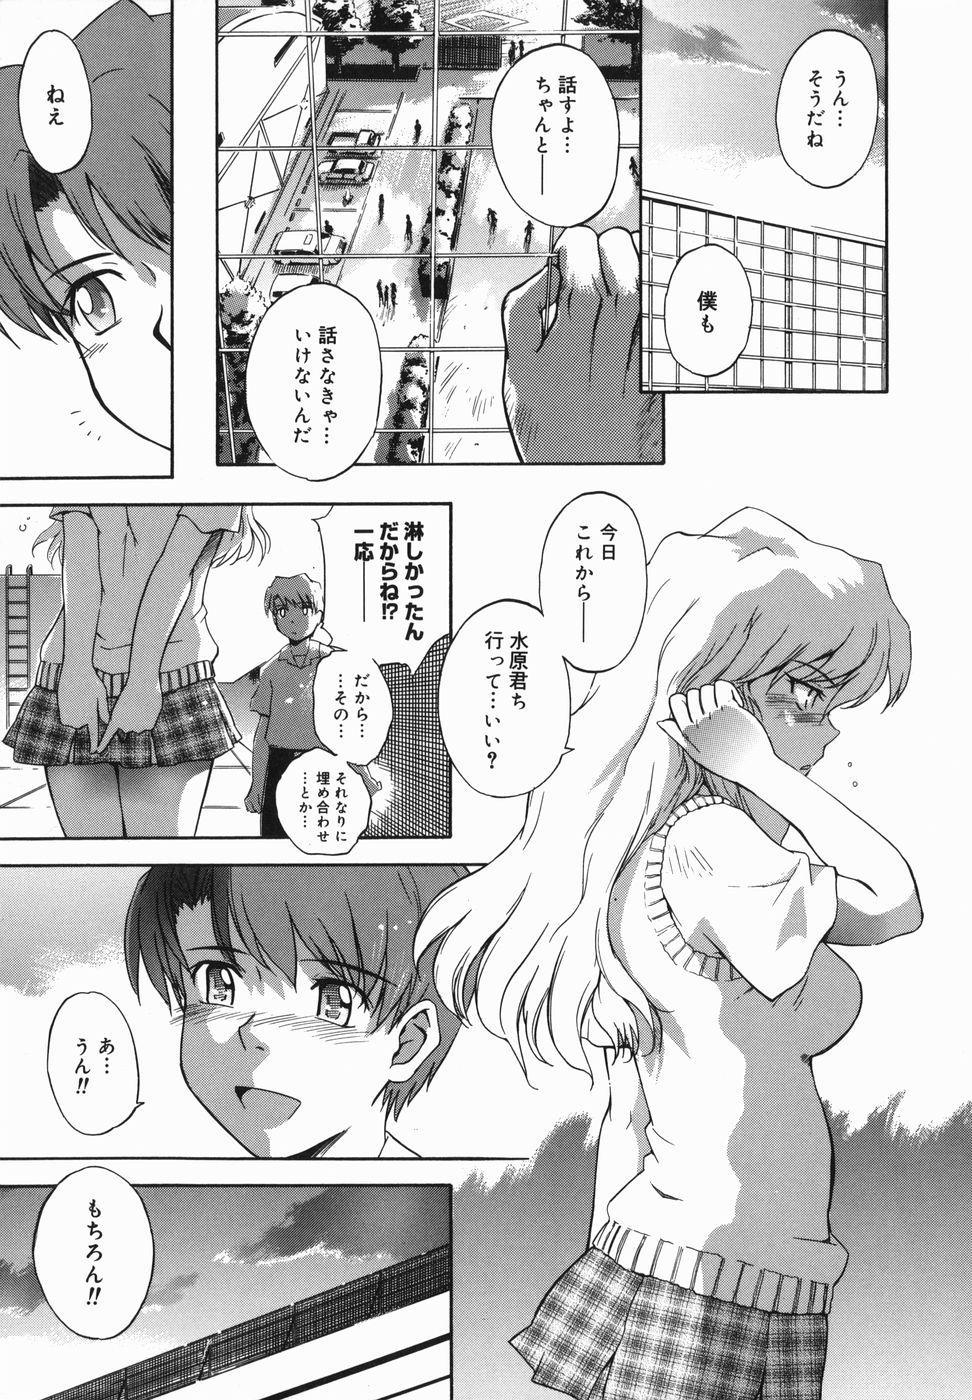 ♭38℃ Loveberry Twins 104